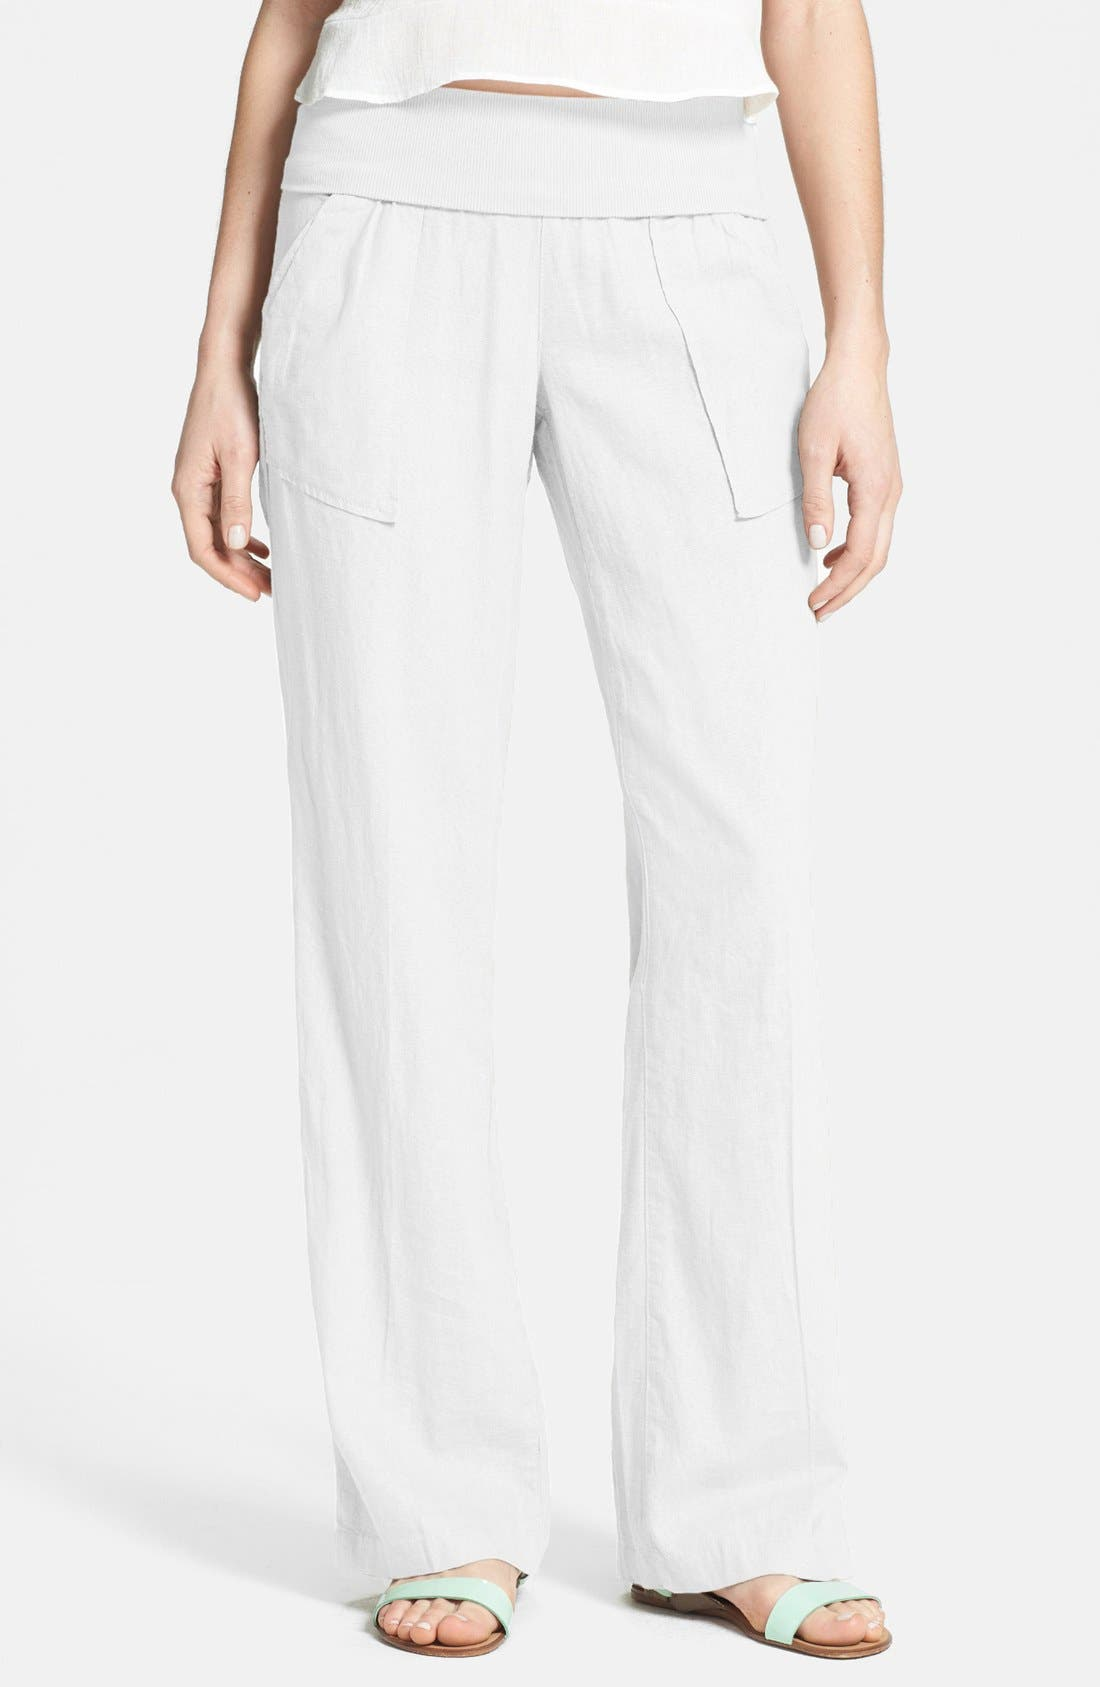 Alternate Image 1 Selected - Jolt Foldover Linen Blend Pants (Juniors)